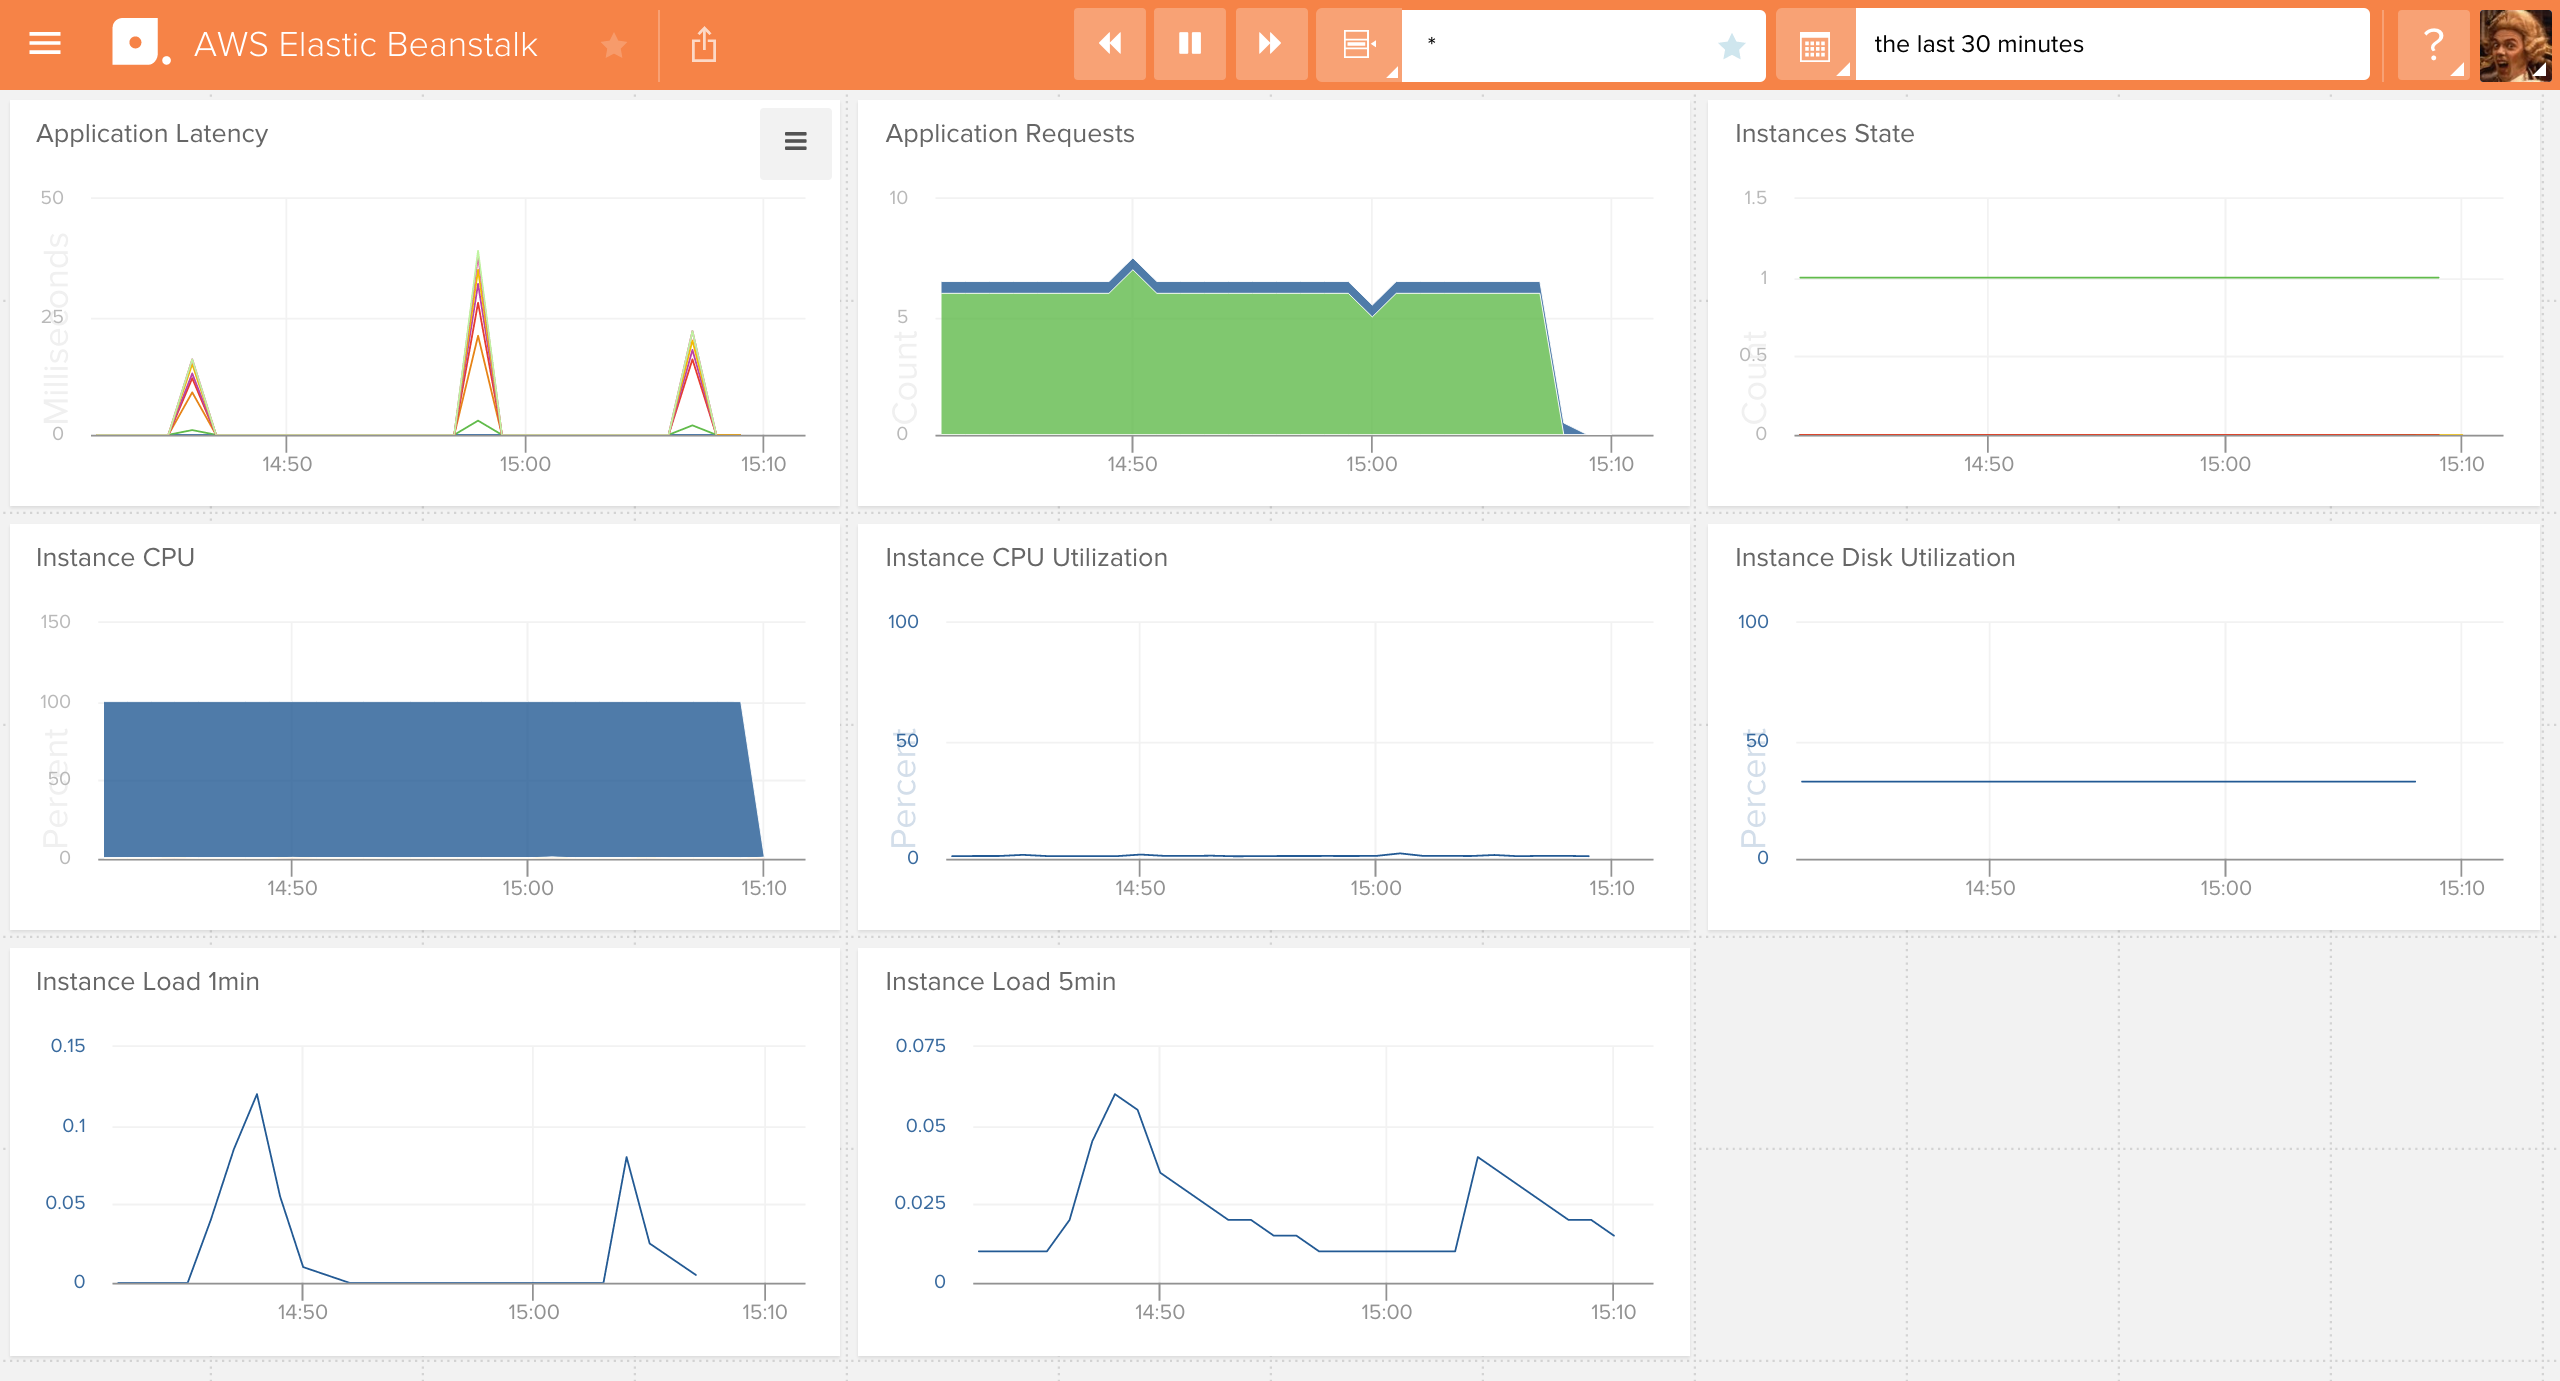 AWS CloudWatch: Elastic Beanstalk enhanced health metrics